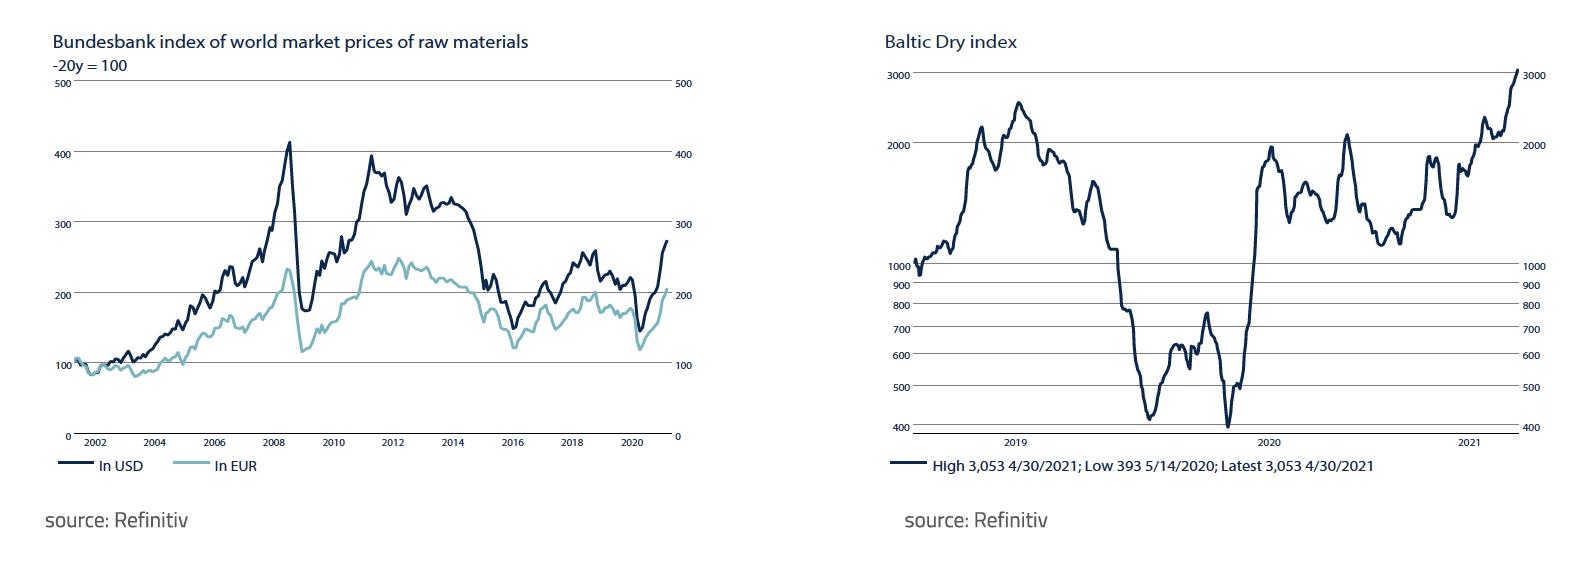 Bundesbank index of world market prices of raw materials